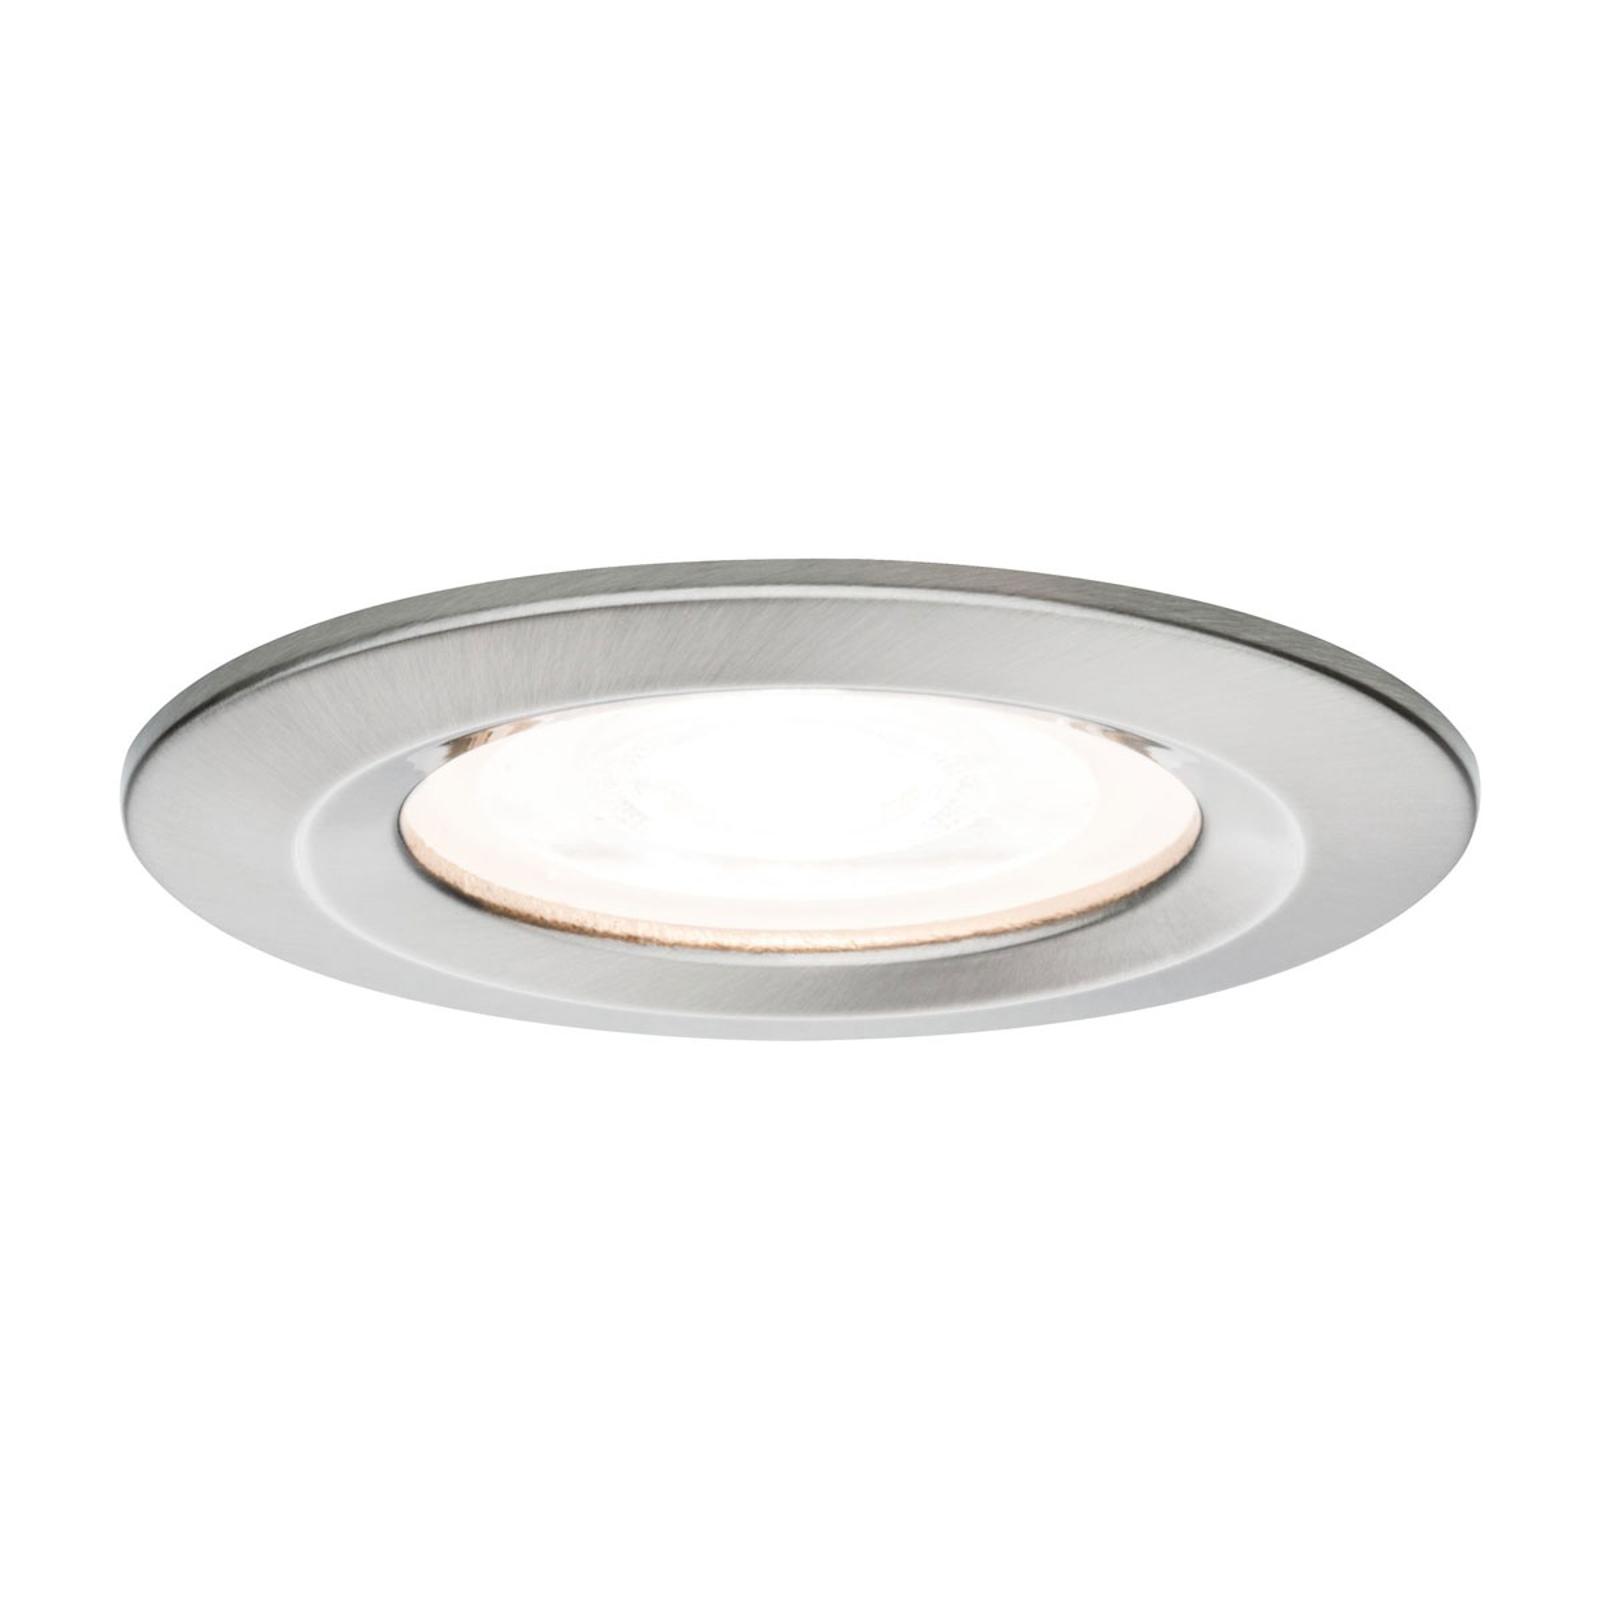 Paulmann LED-Spot Nova rund, IP44, dimmbar, Eisen